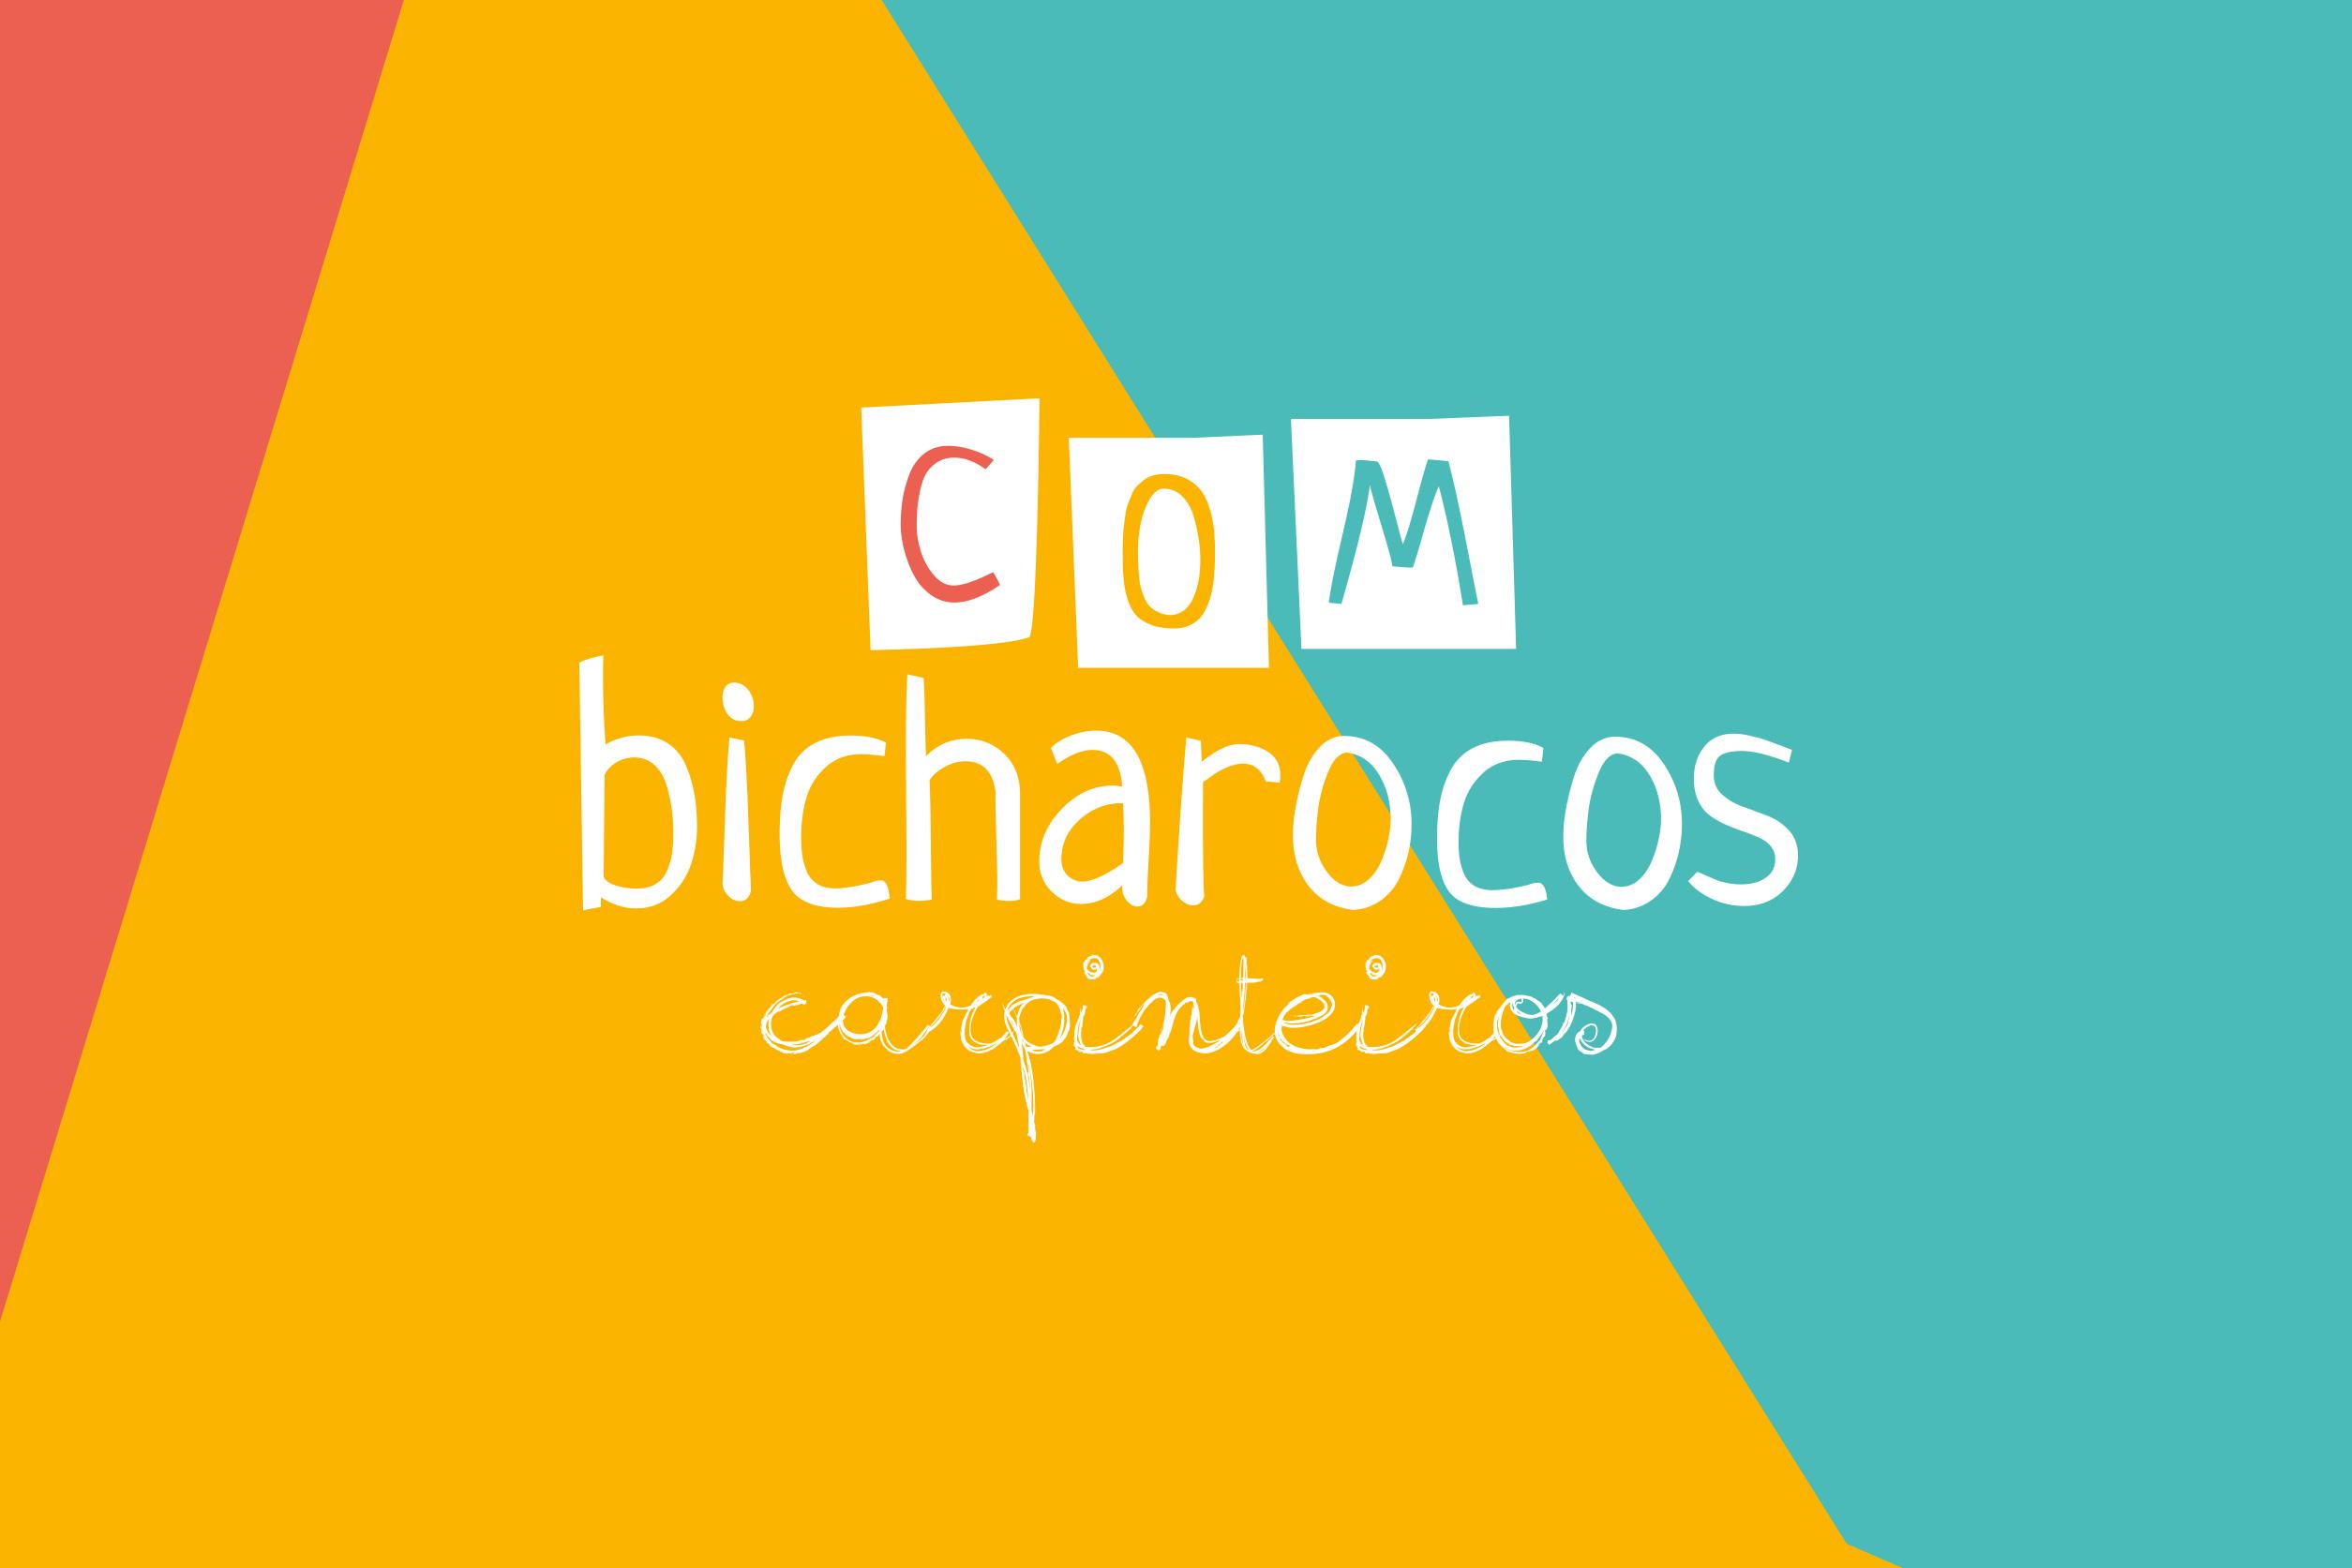 bicharocos_logo